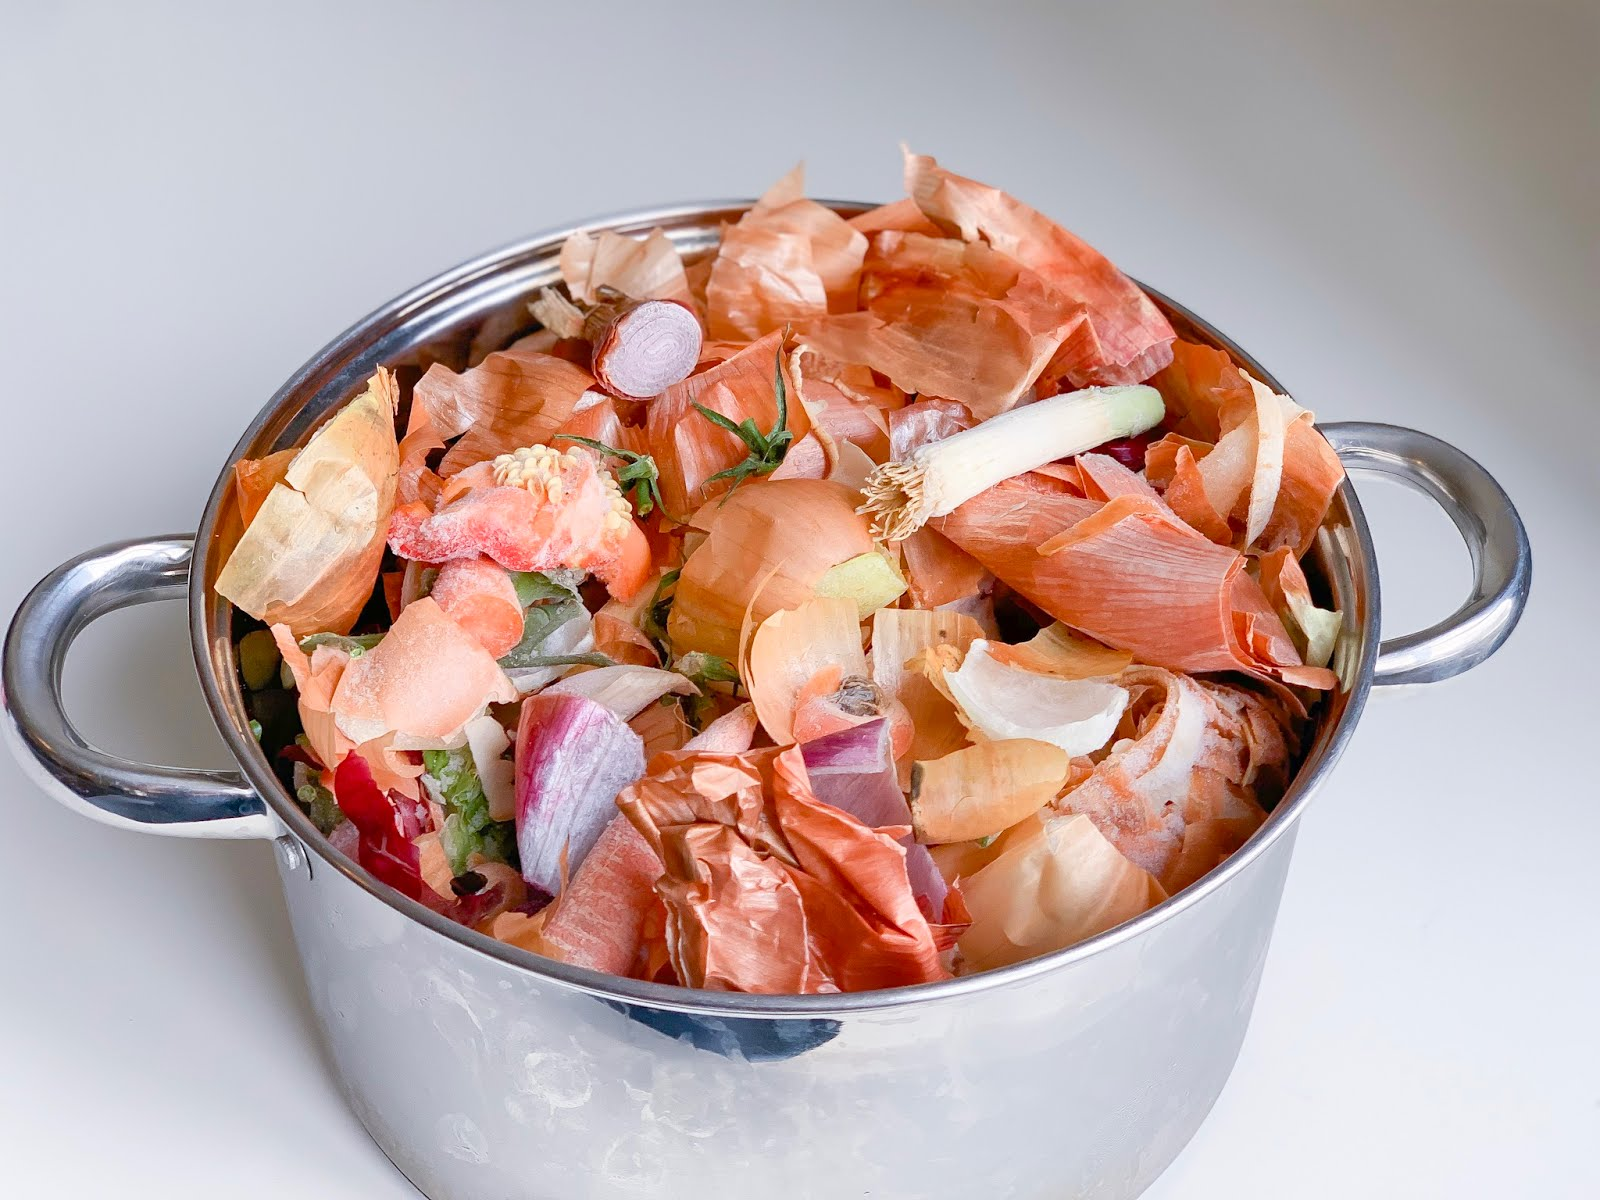 Easy, Frugal & Vegan Plant-based Penny Stock Recipe (Vegetable Scrap Broth)